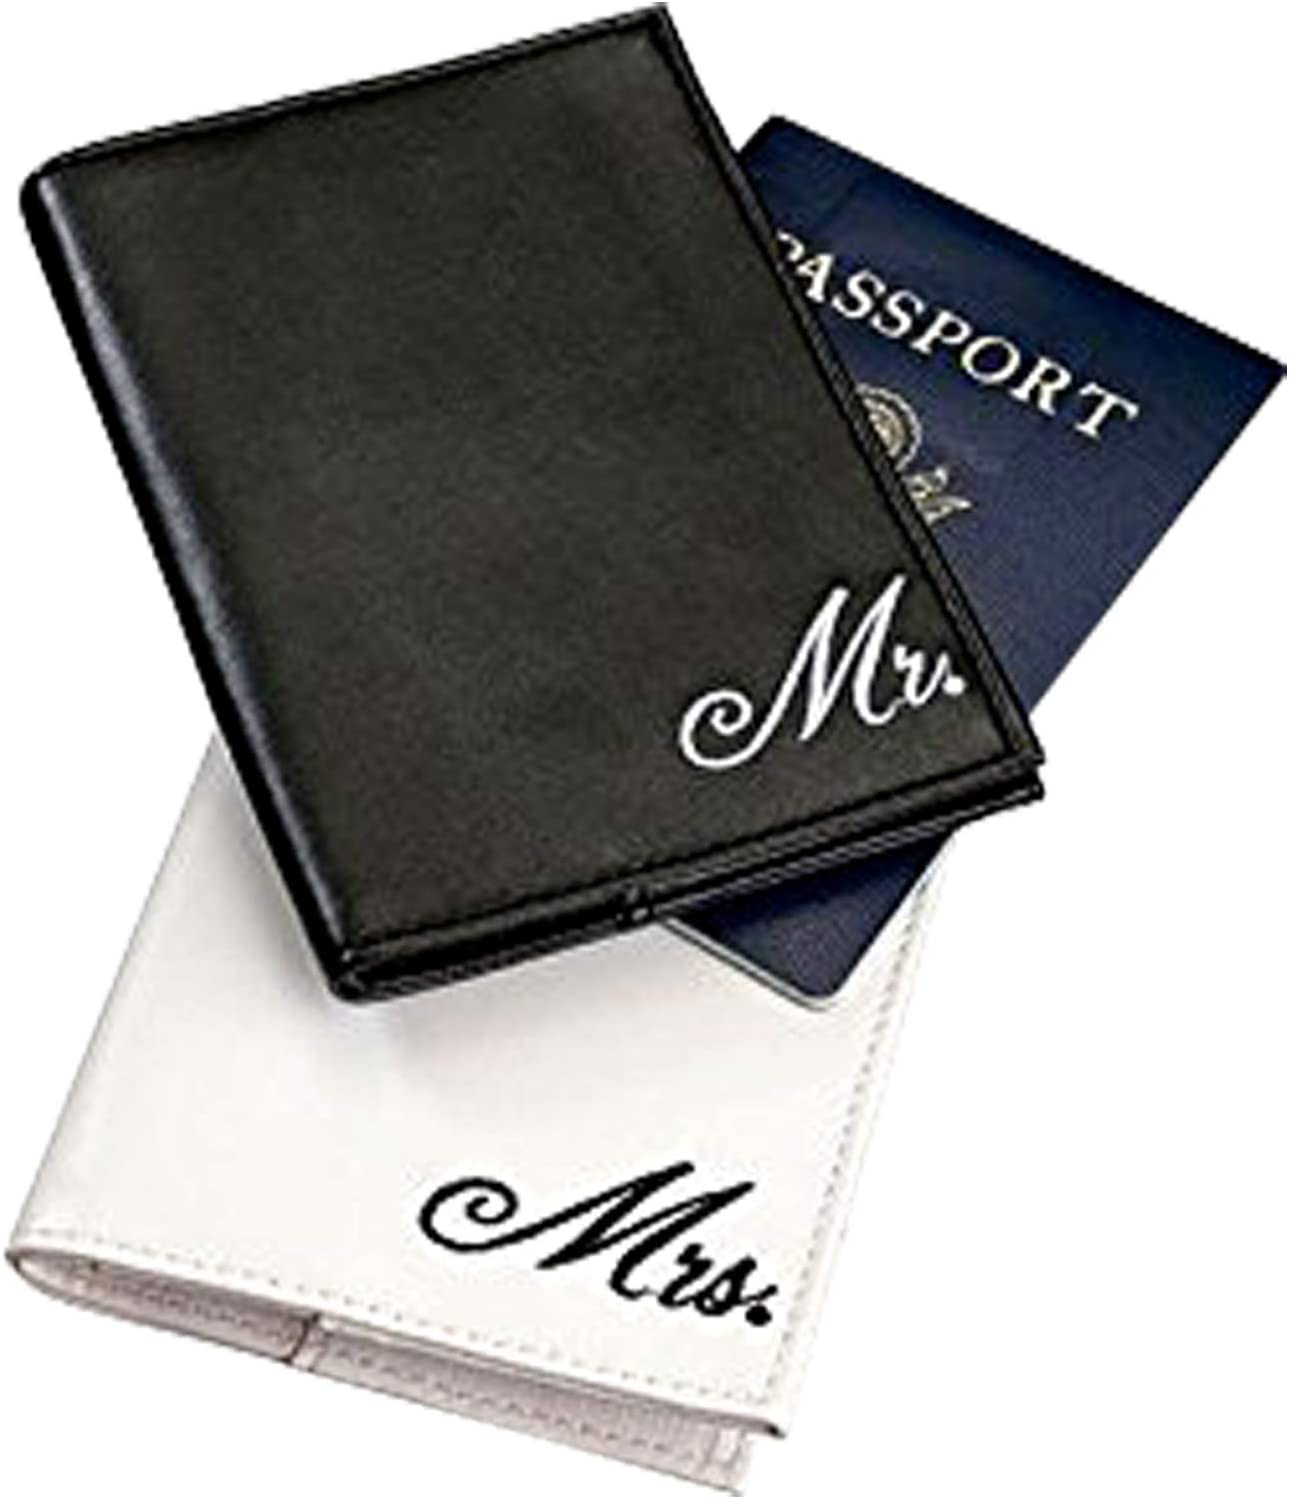 and Mrs Mr Travel Gift,Couples Wedding Gift,Disney Wedding Gift,Mr./&Mrs Passport Cover,RFID Passport Cover,Anniversary Gift,Couples Gift